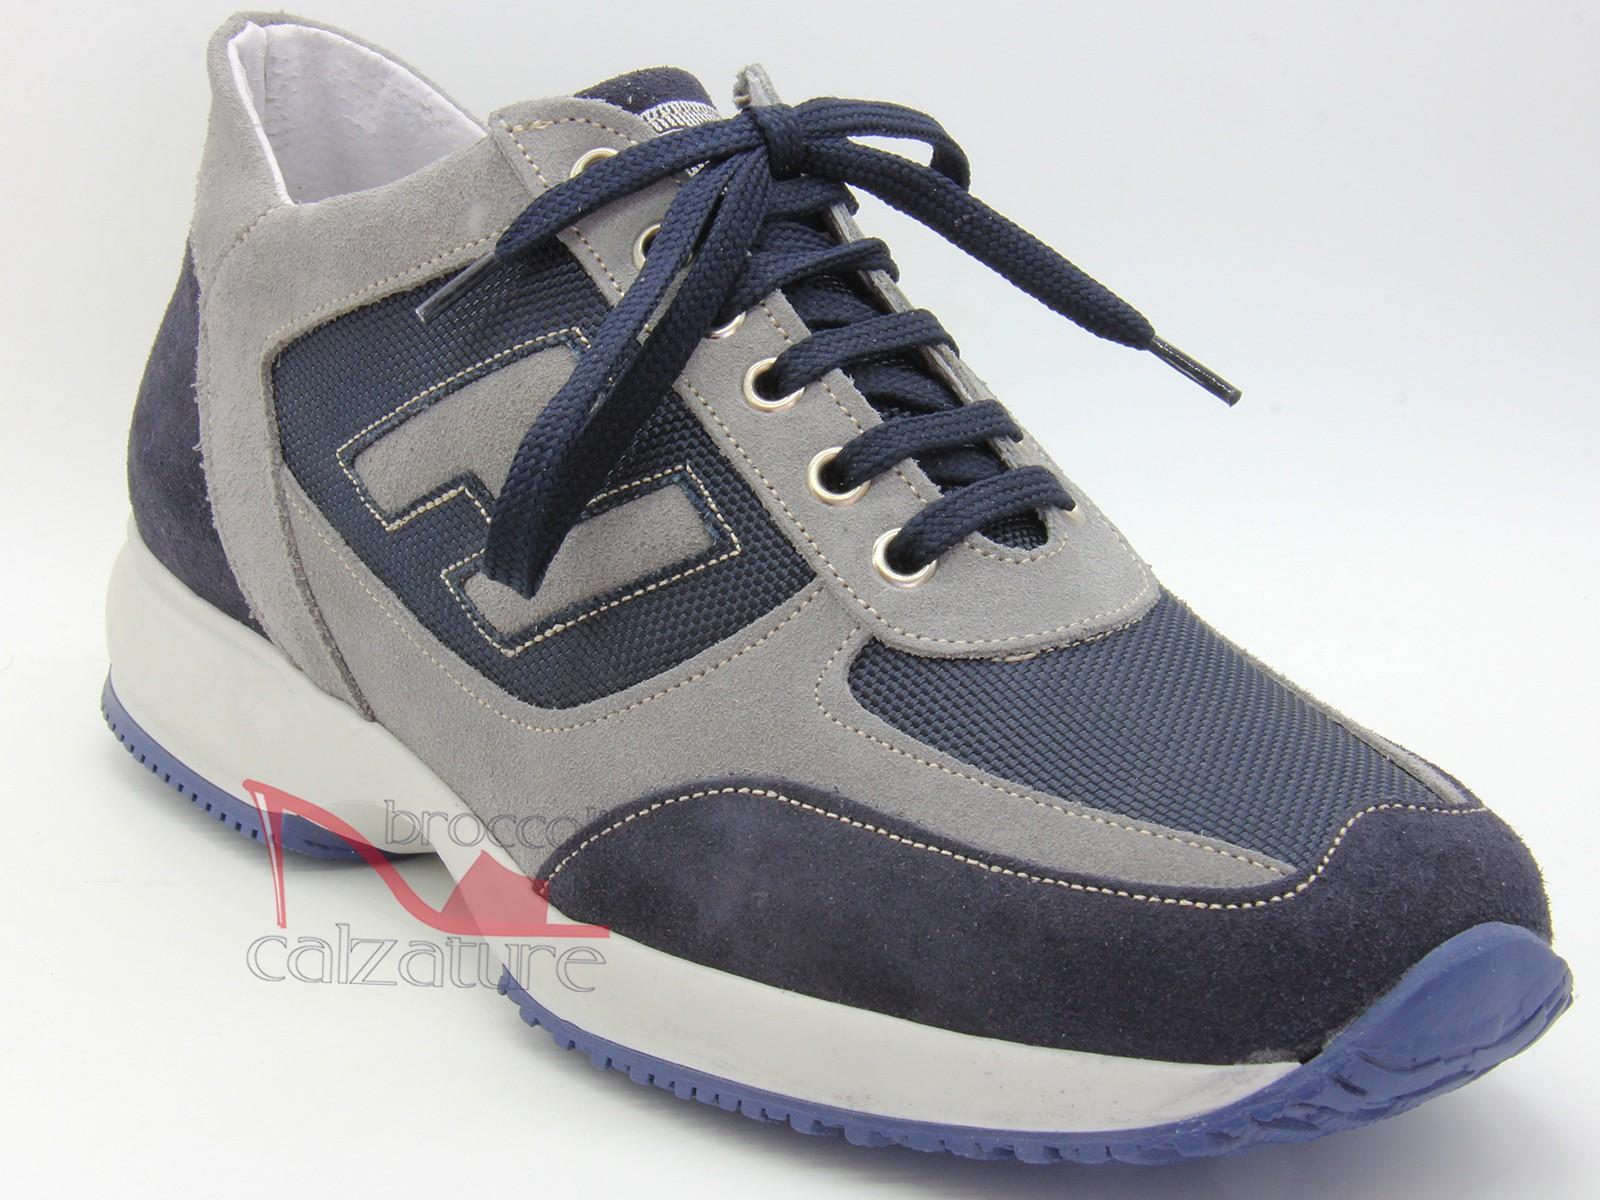 SCARPA SPORTIVA BRUGER scarpe sportive uomo